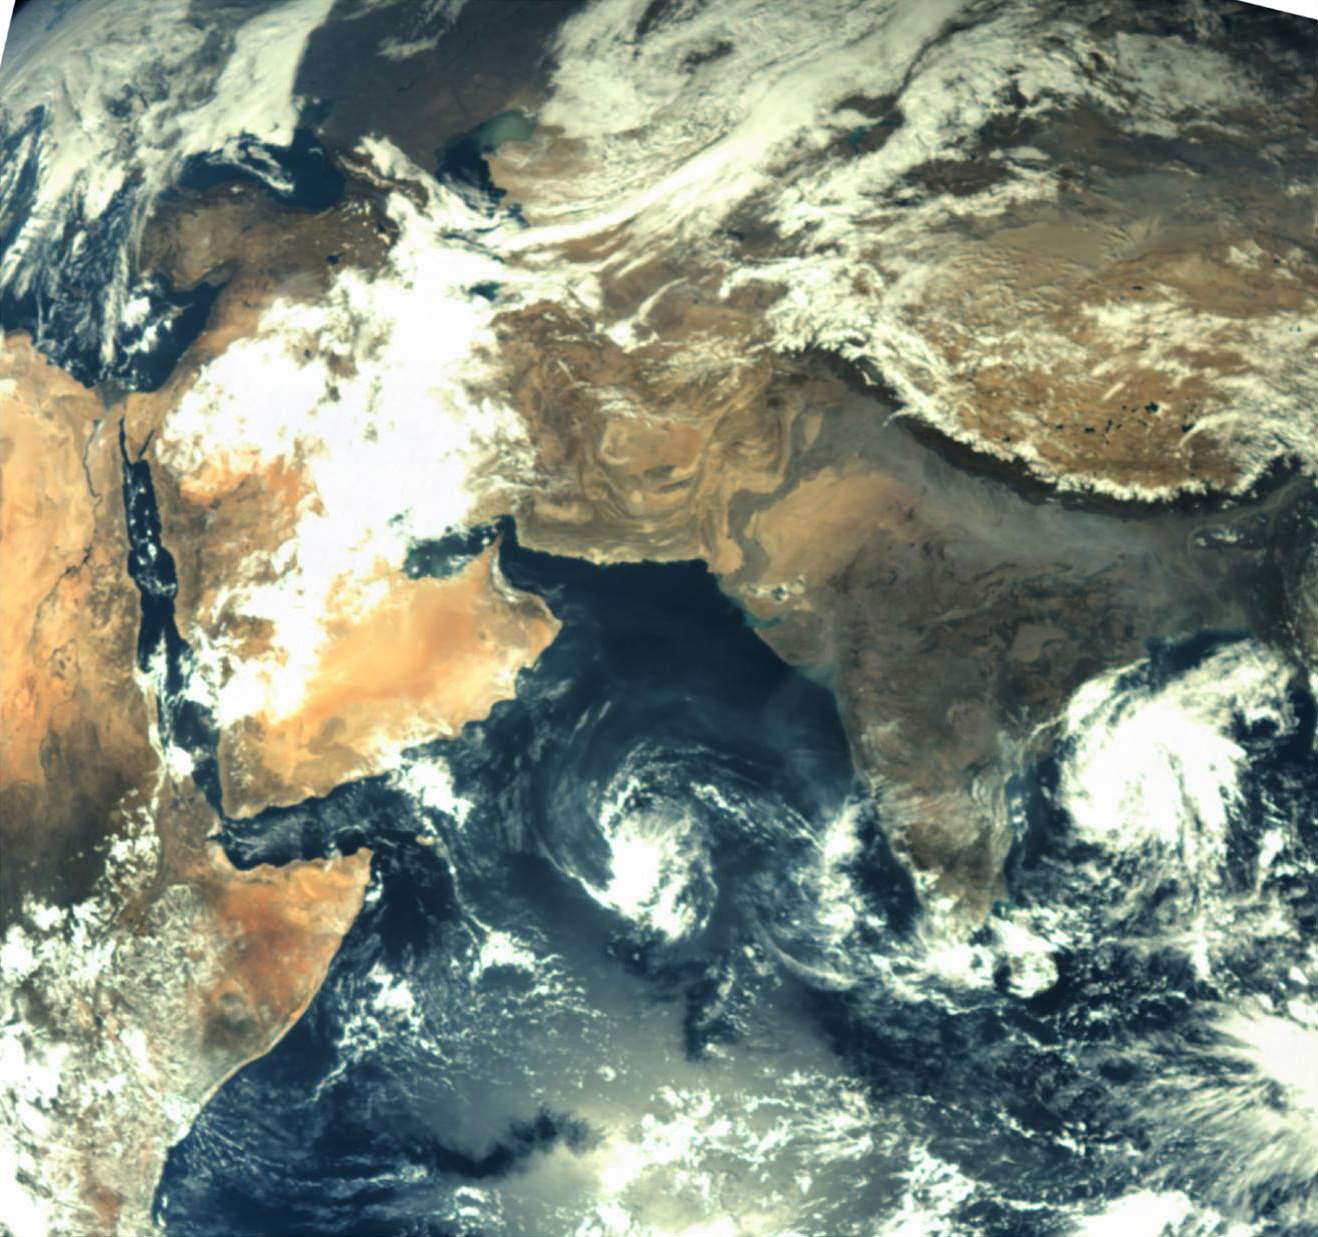 Mars Orbiter Mission India 2013 India's Mars Orbiter